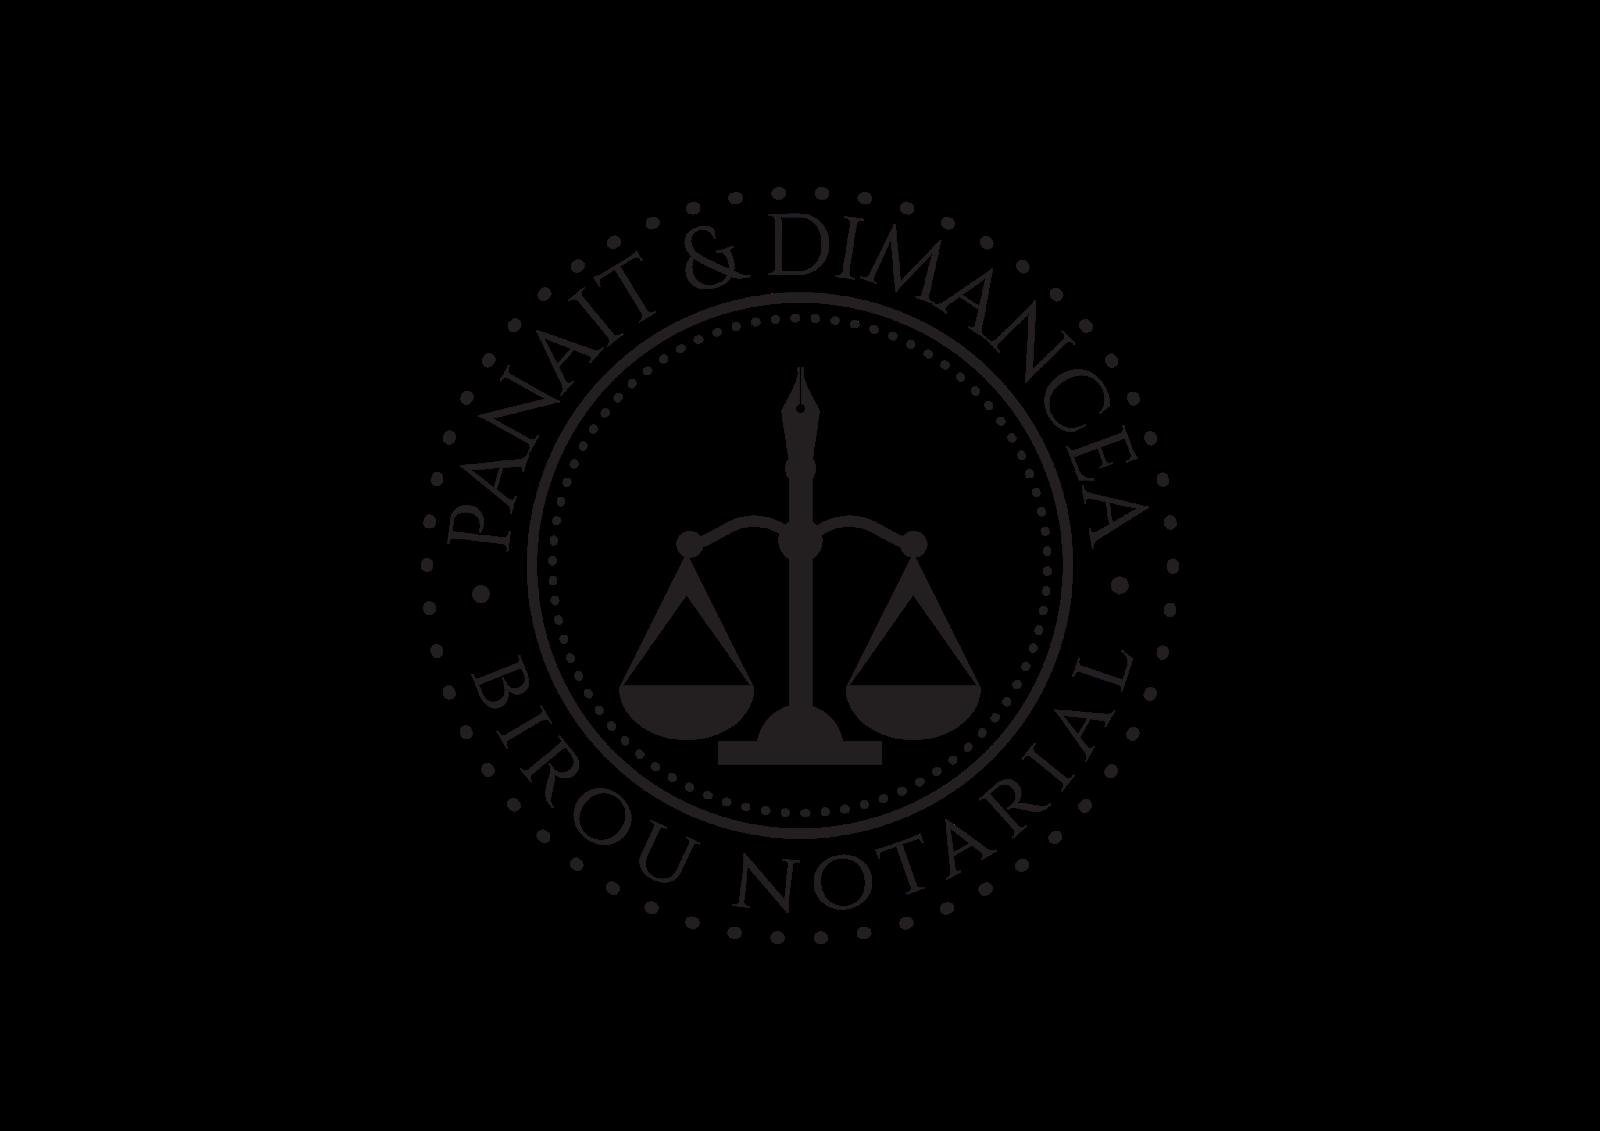 notary public logo panait dimancea krado rh elkrado blogspot com notary public logan utah notary public logansport in